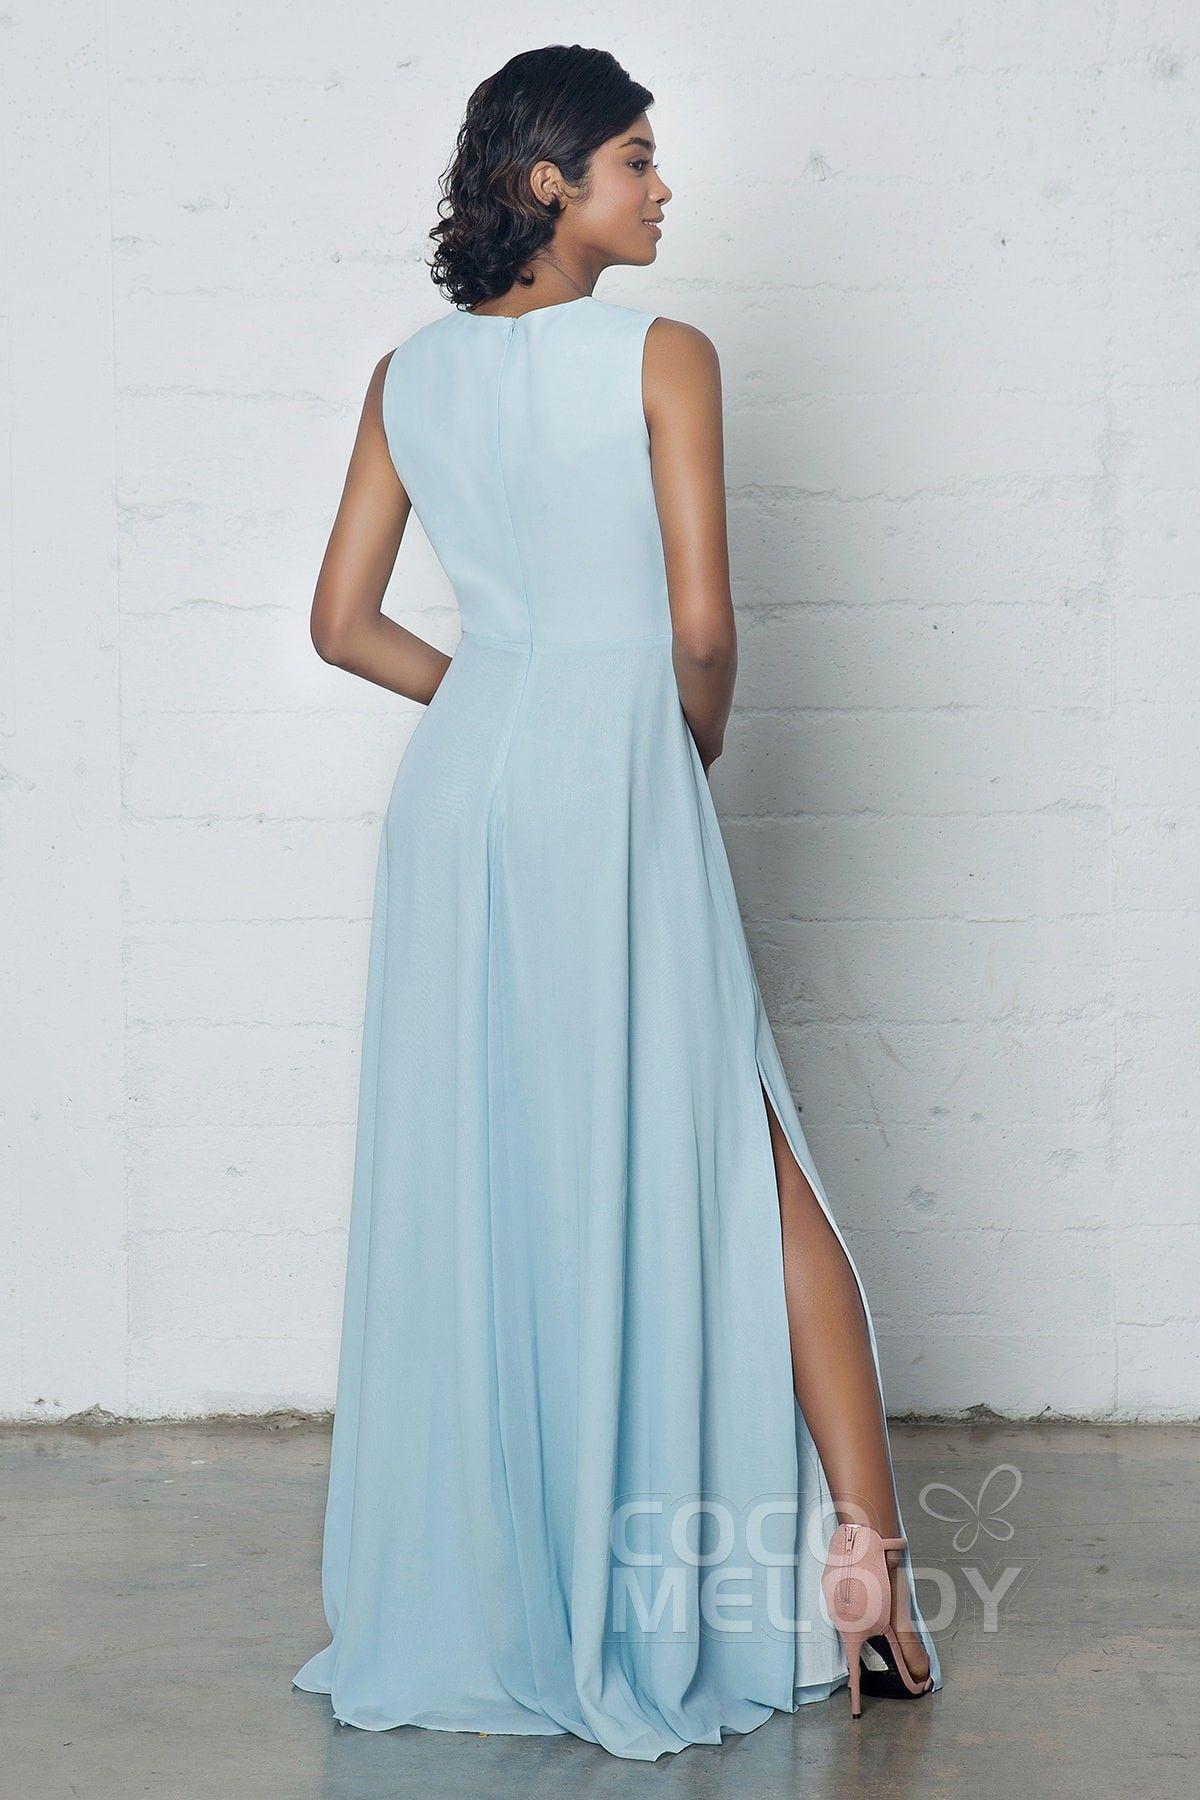 Charming Sheath-Column Jewel Natural Floor Length Chiffon Sleeveless Zipper Split PR17023#cocomelody #promdresses #party#dresses#